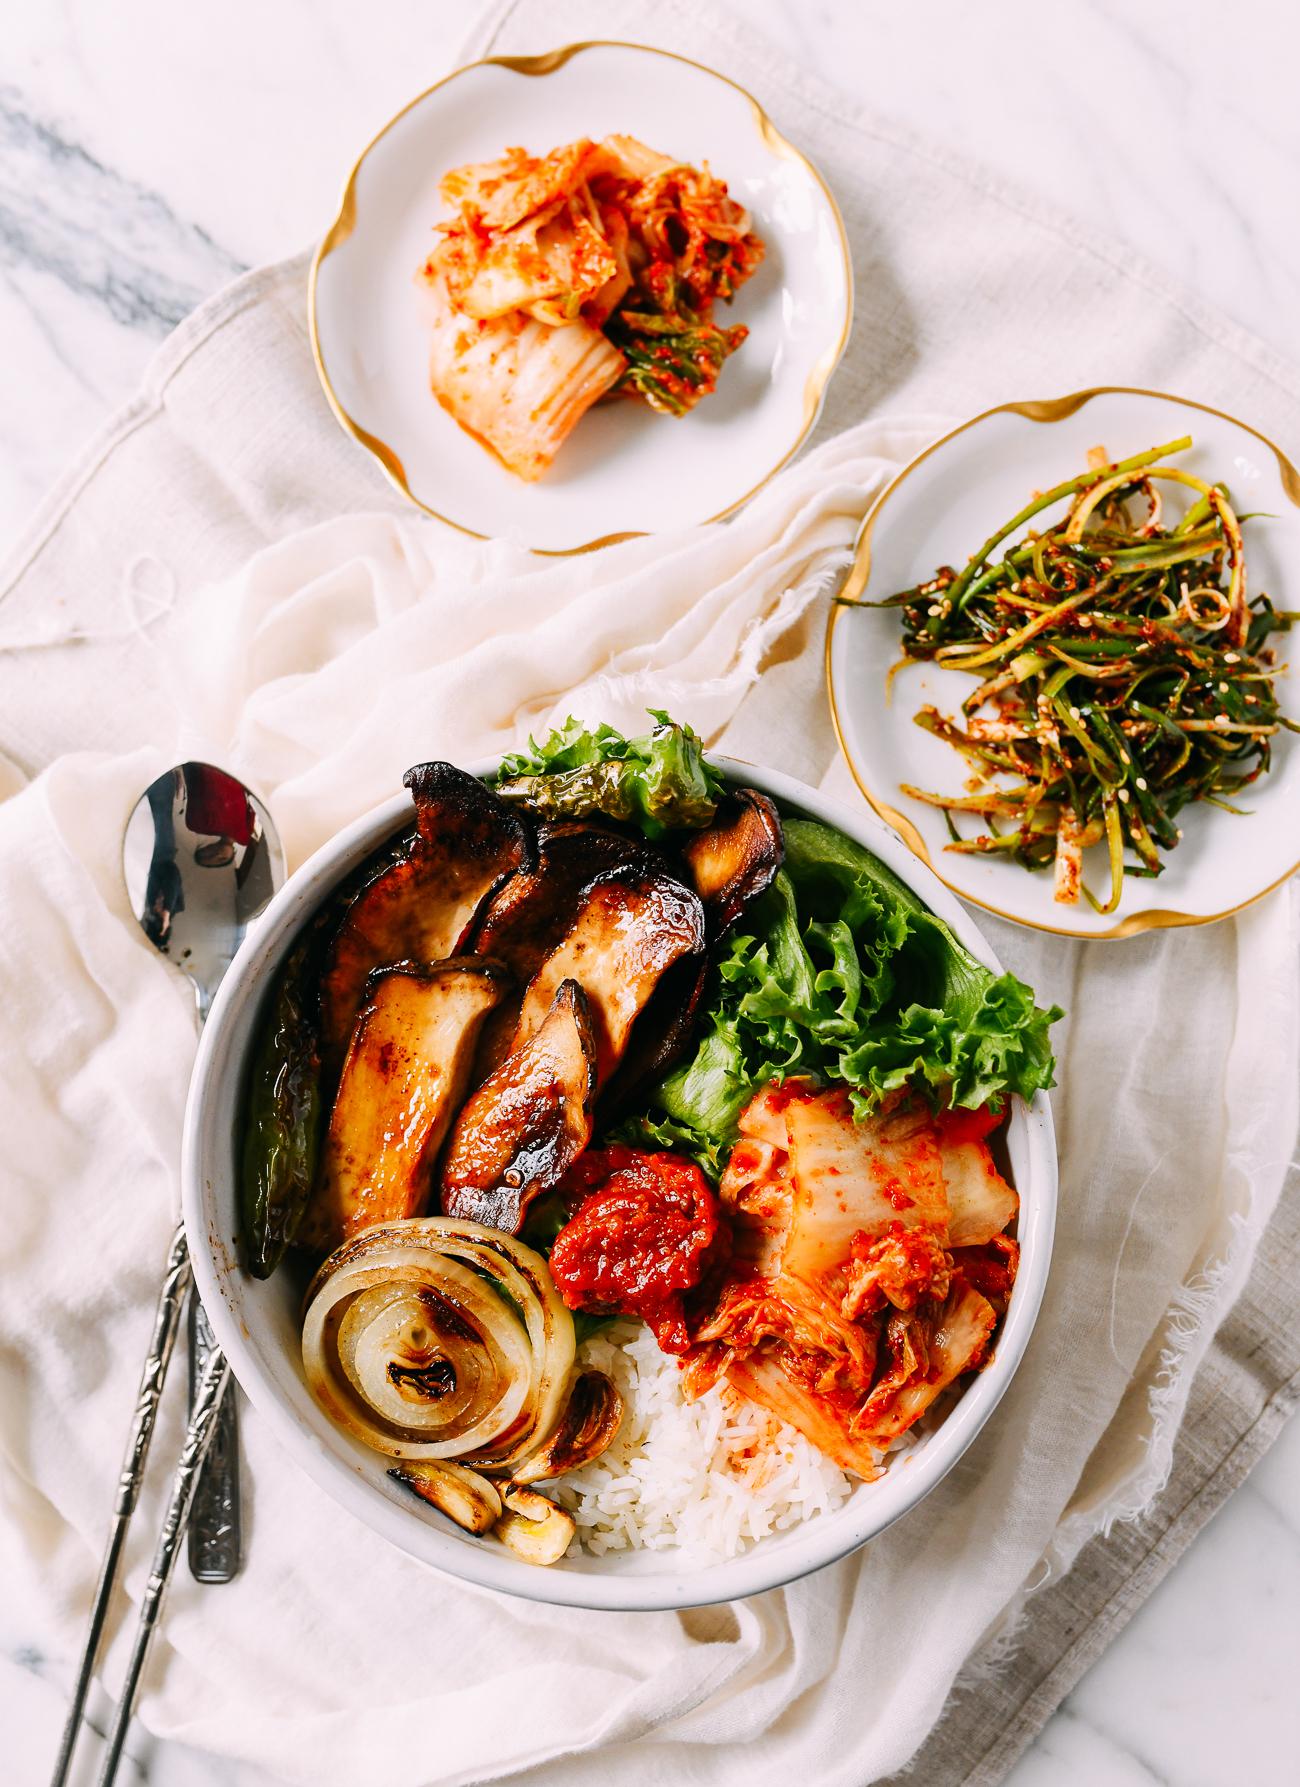 Vegan Korean BBQ Bowl with King Oyster Mushrooms